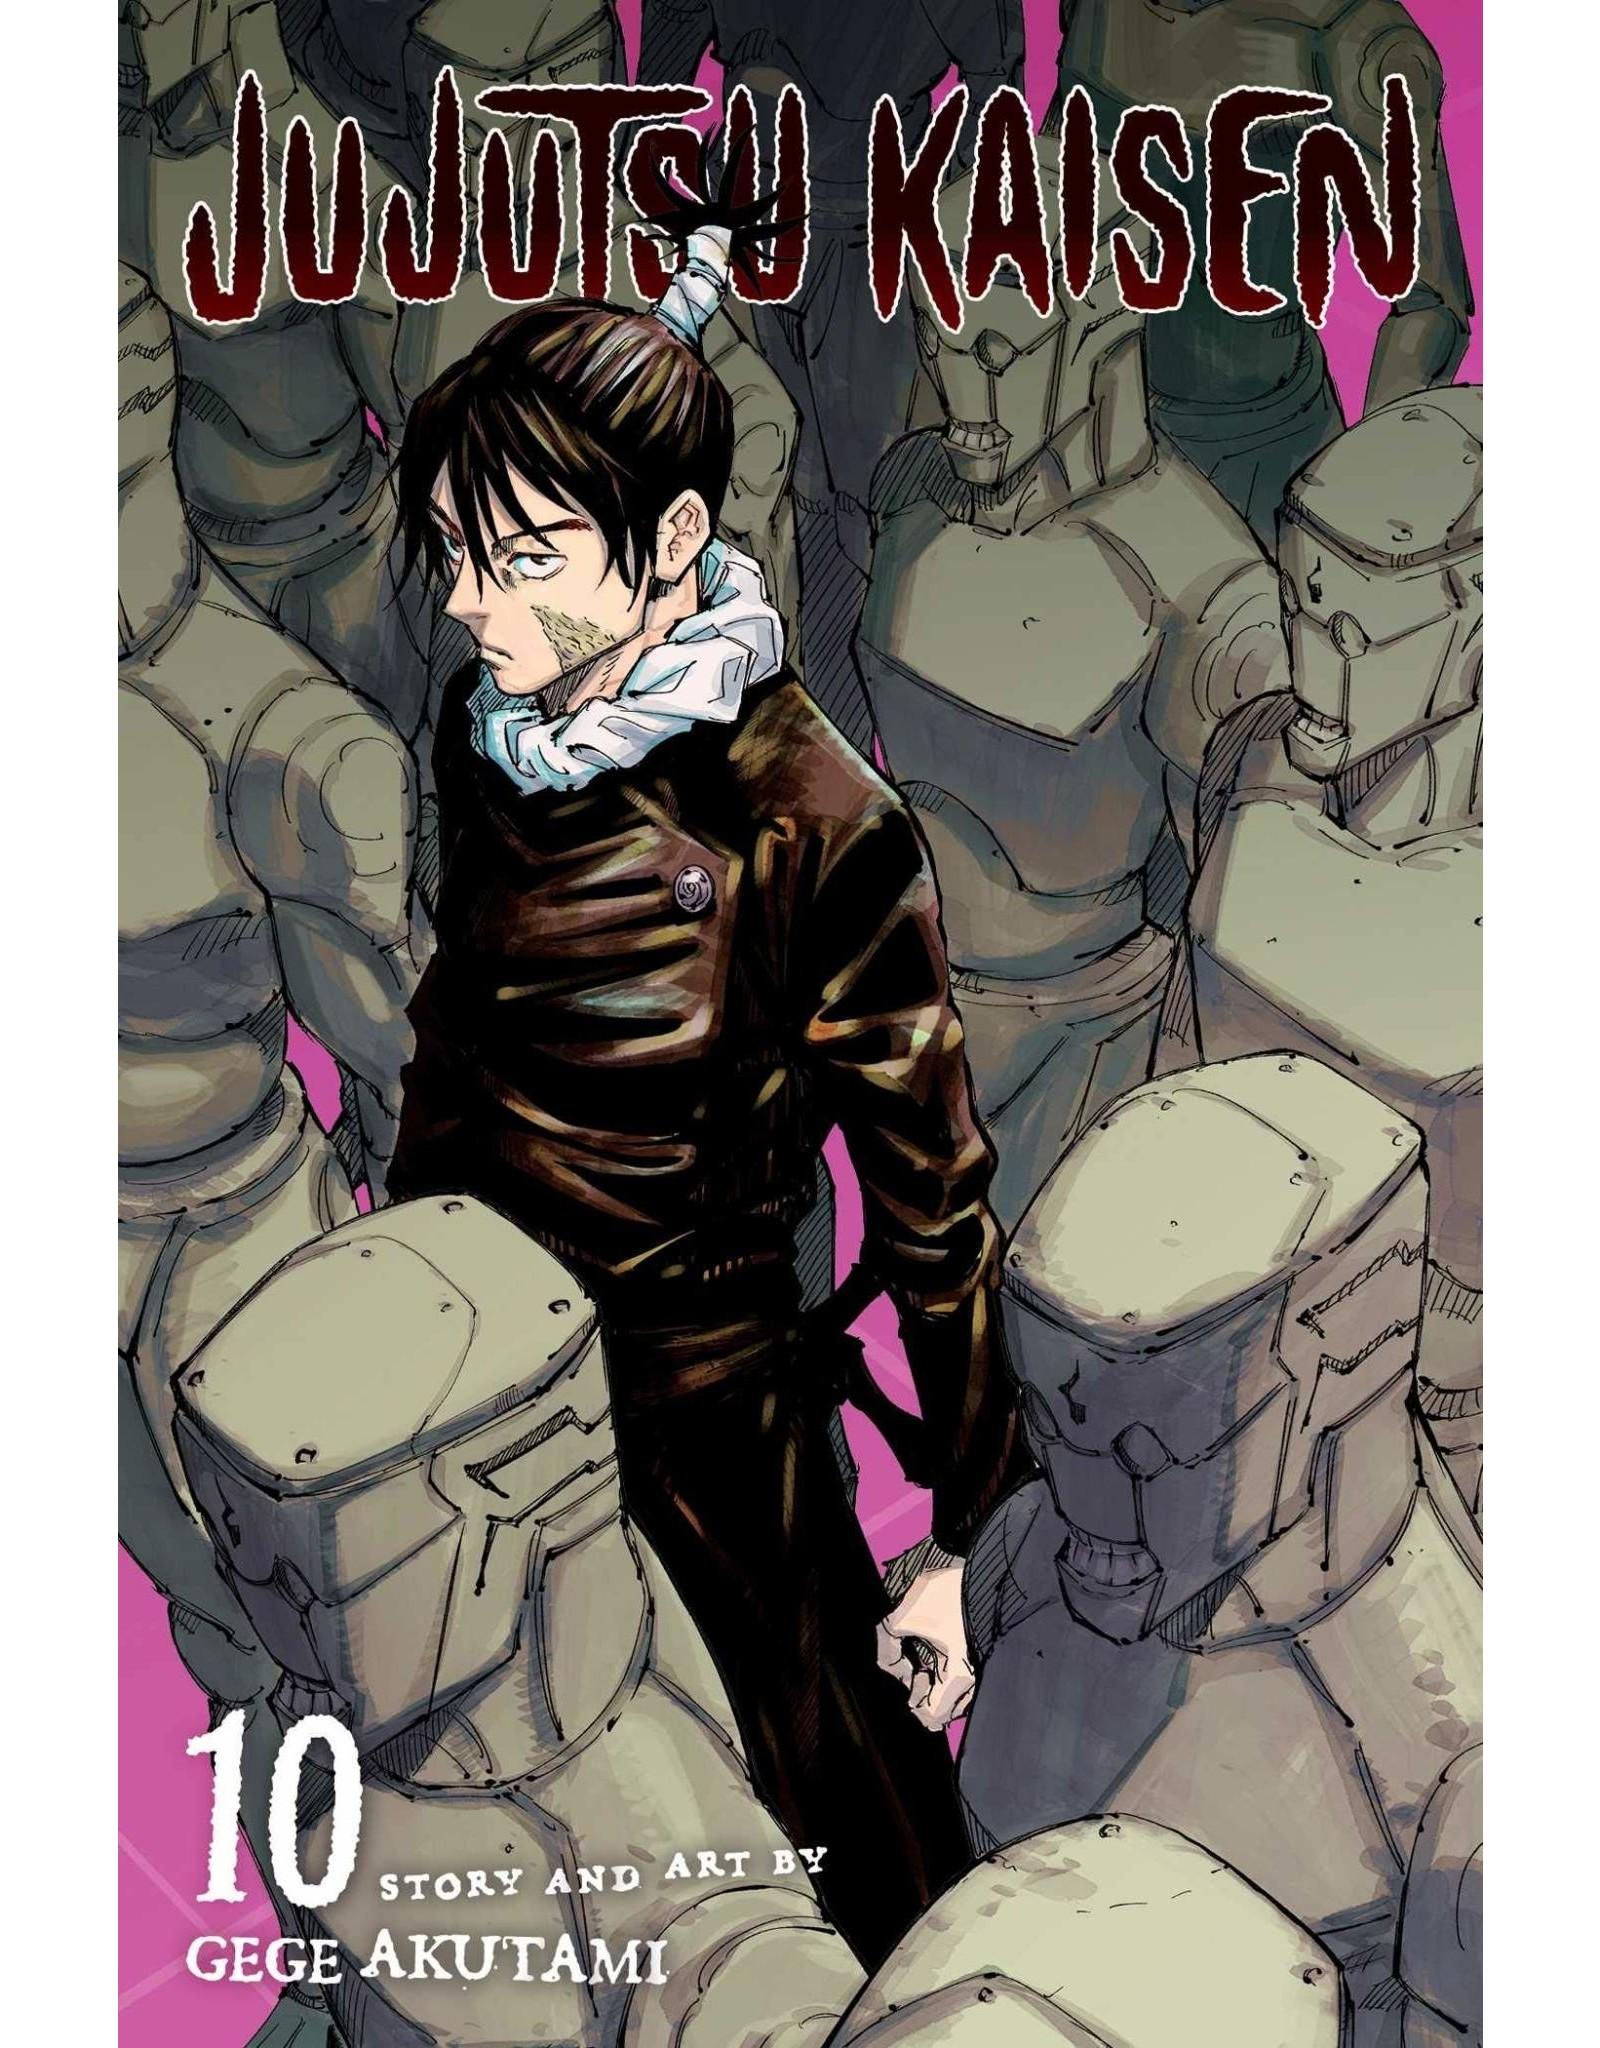 Jujutsu Kaisen 10 (Engelstalig) - Manga